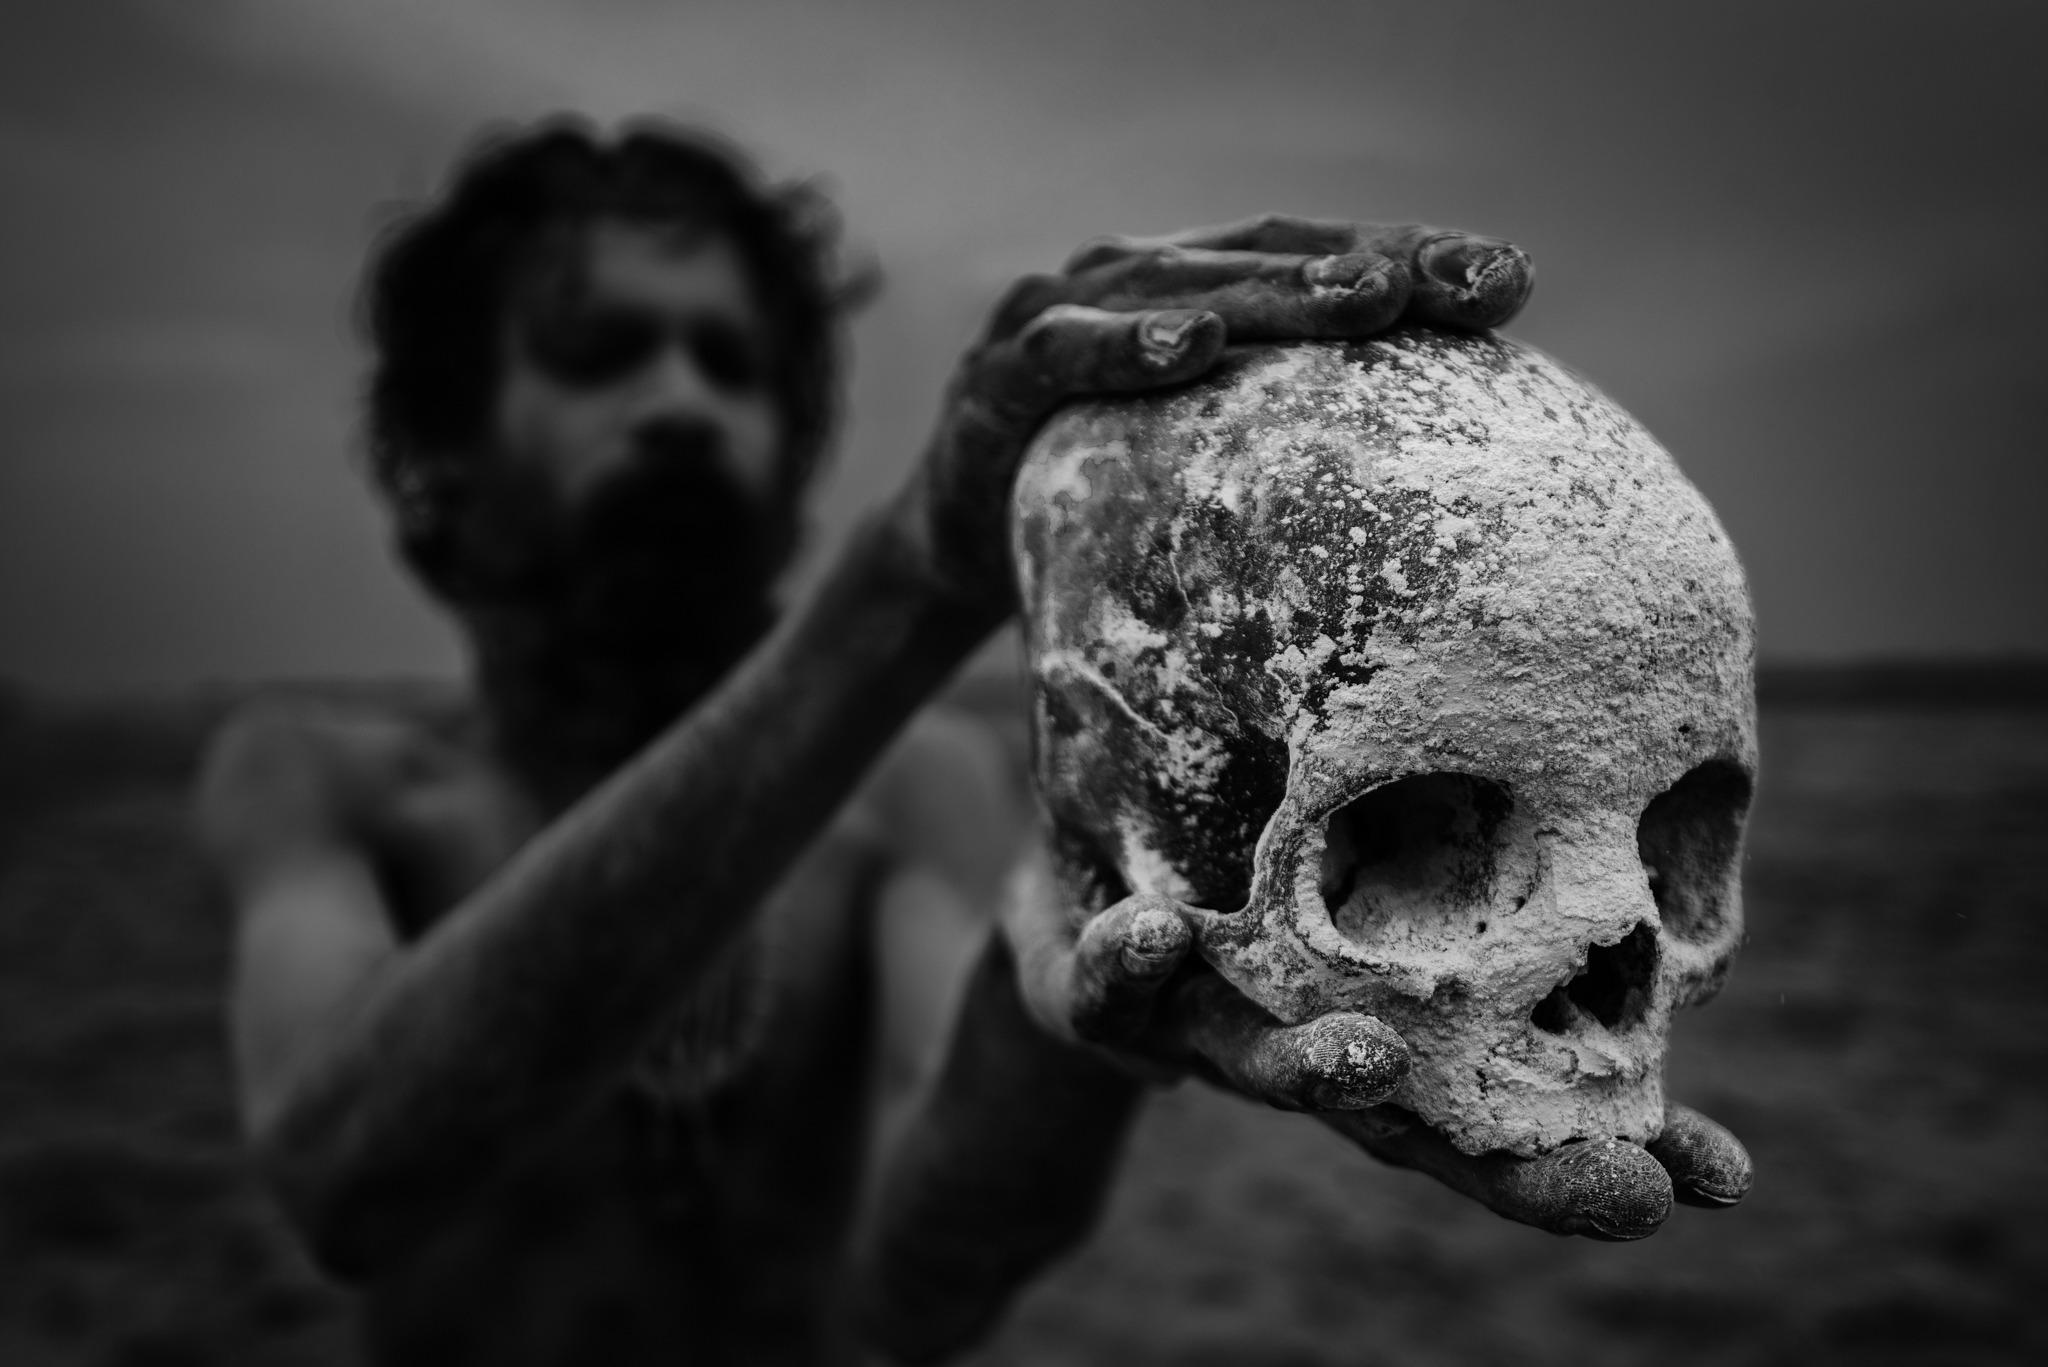 Aghori sadhu with skull